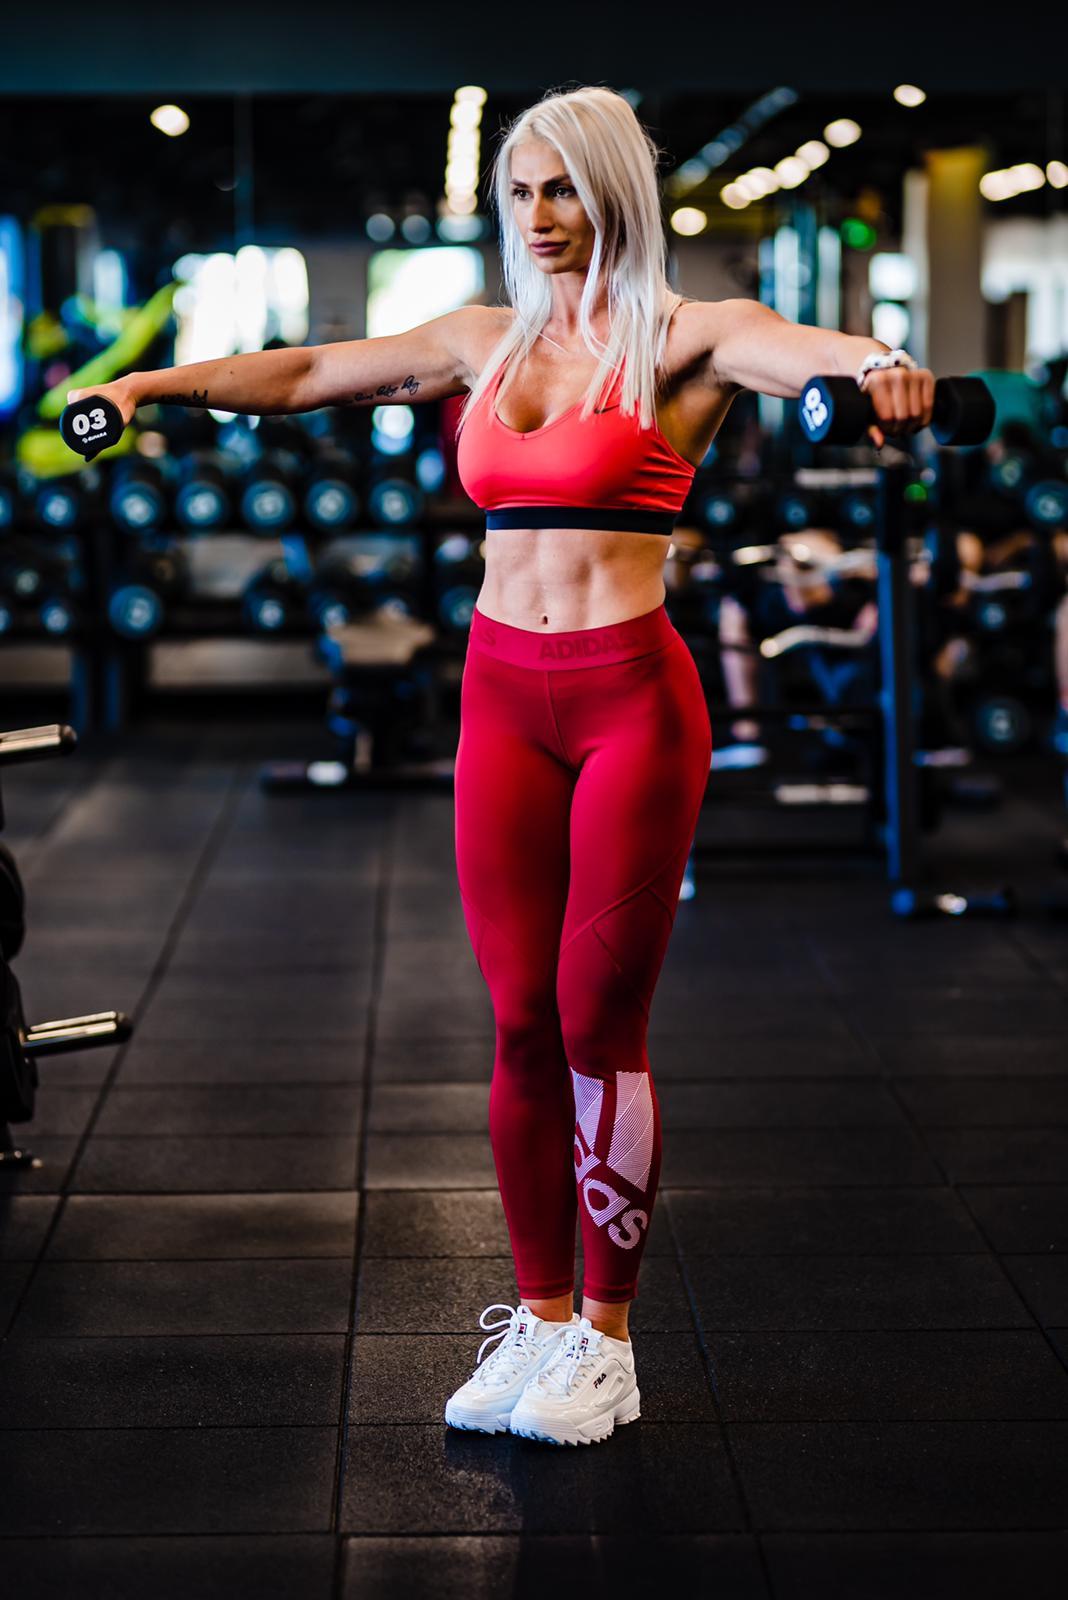 Bianca Soplea Personal Trainer 2